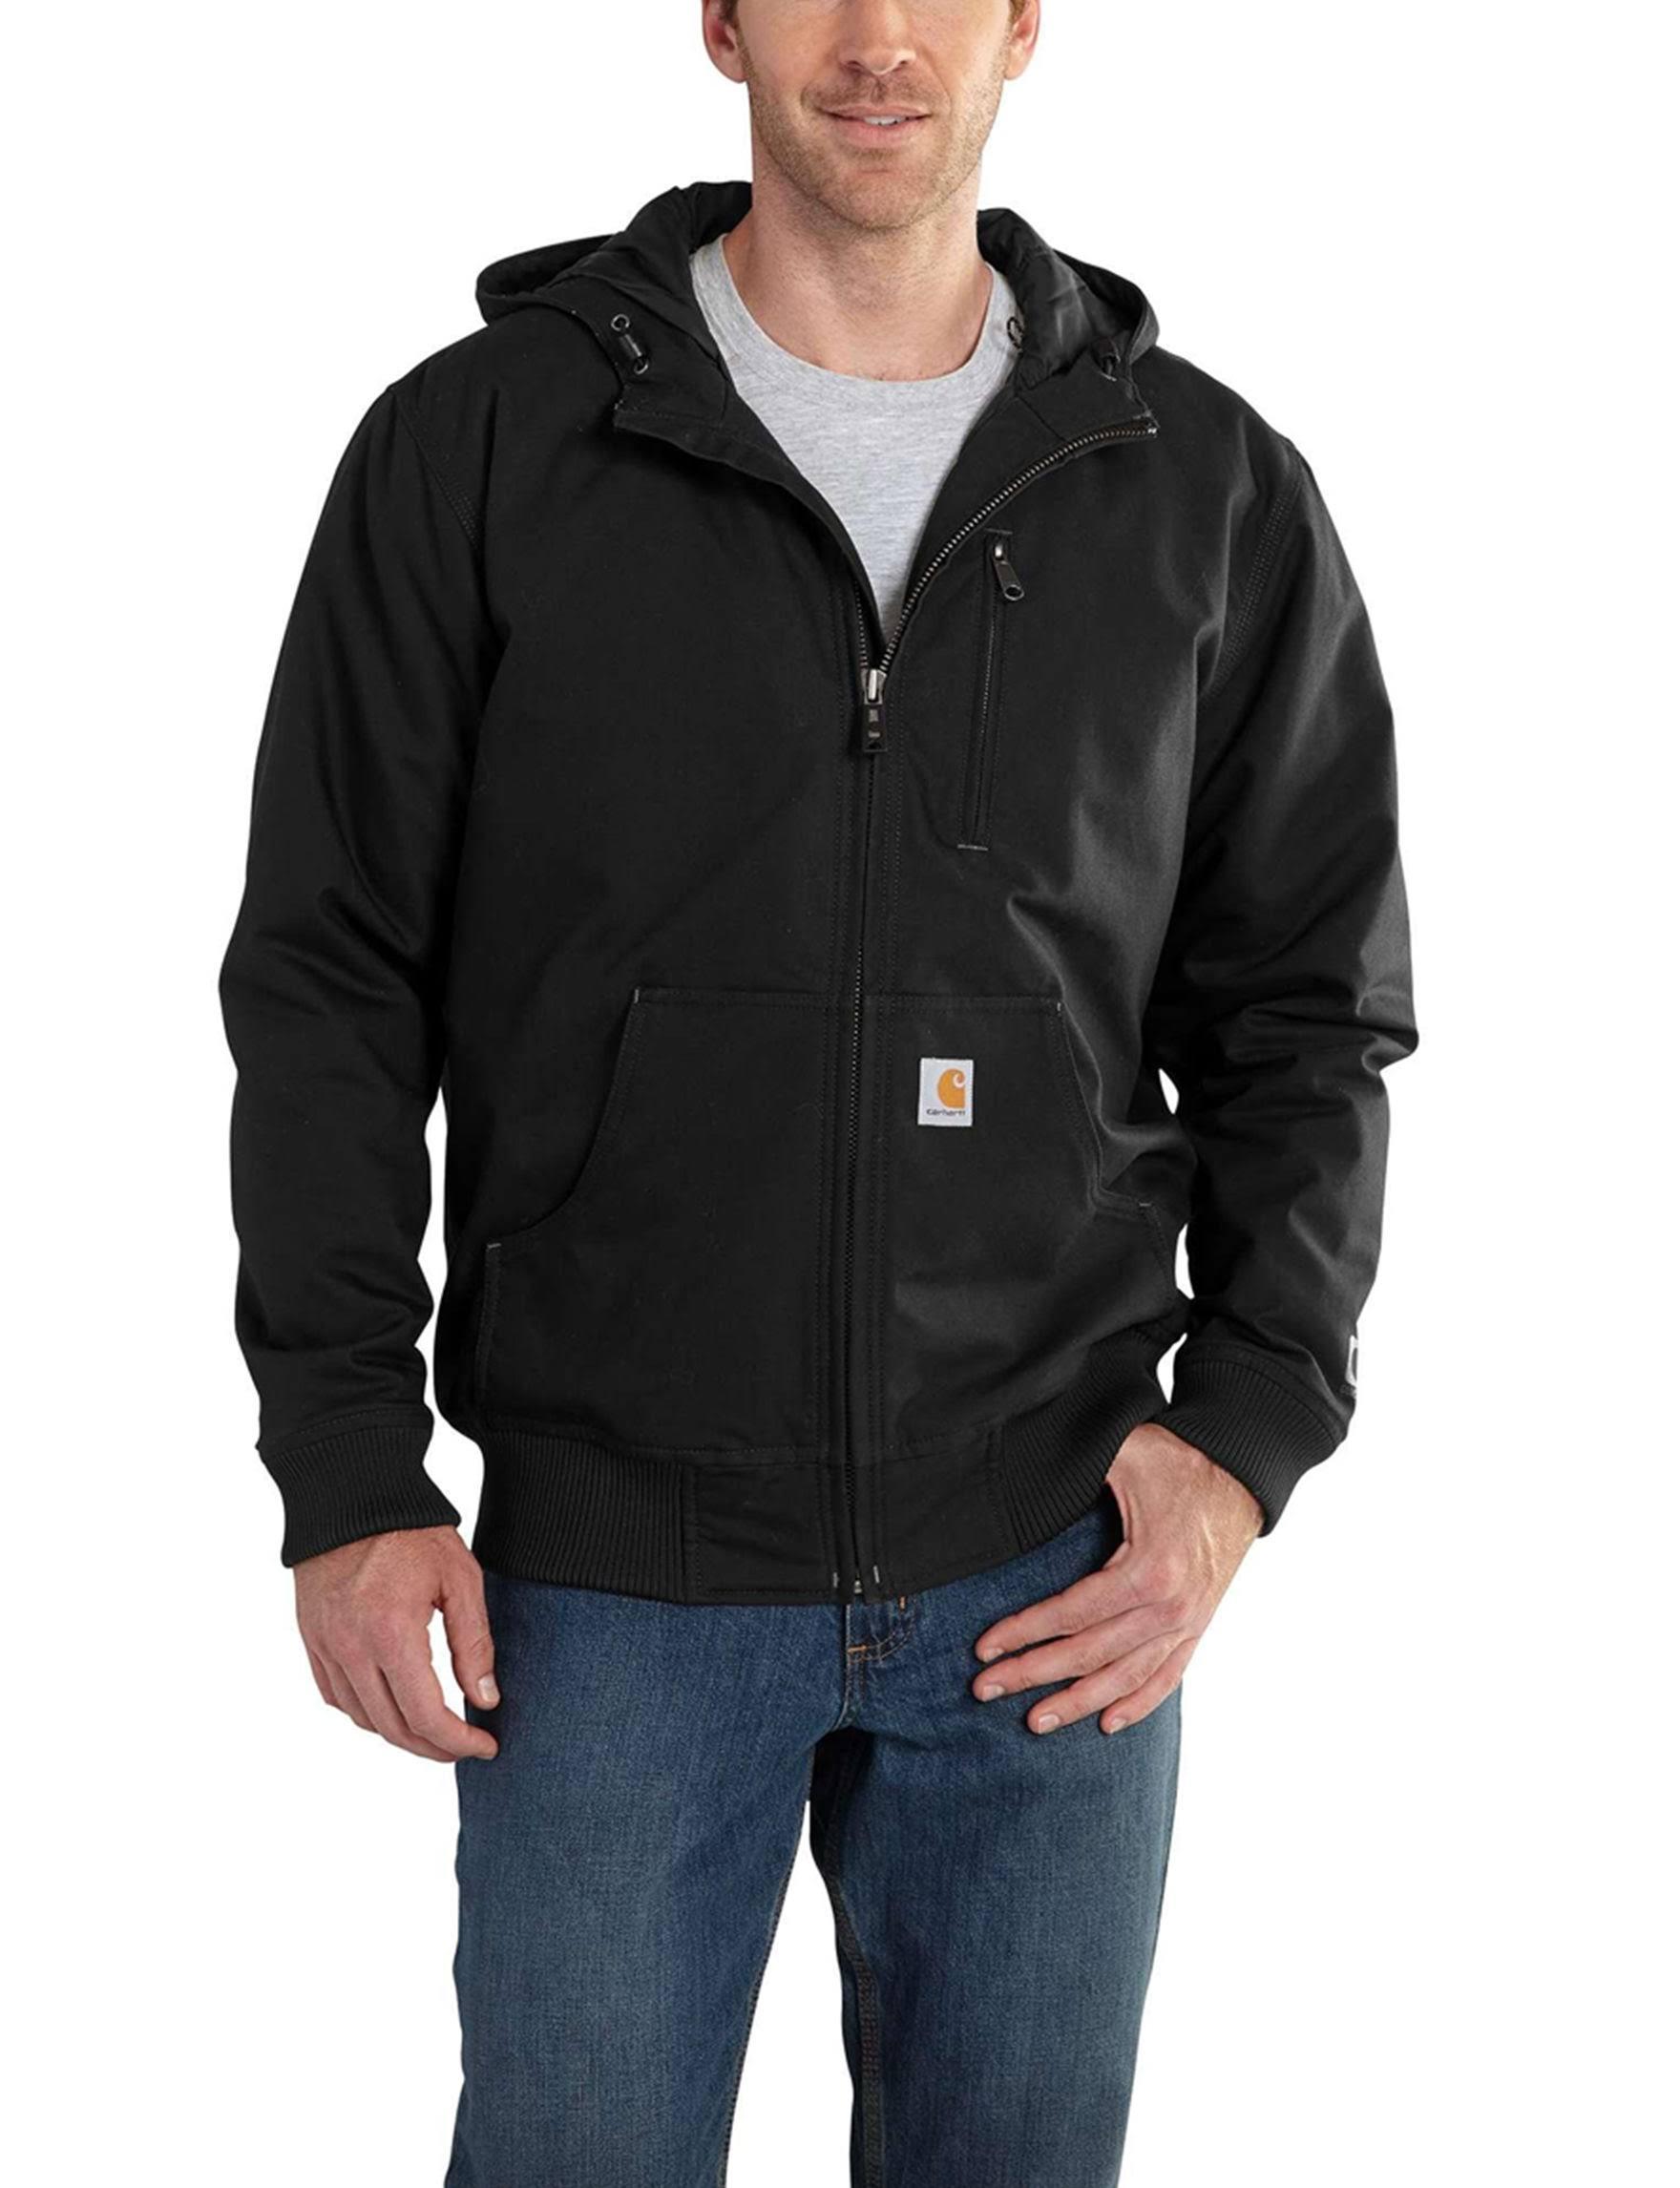 Midwestworkwear Jefferson Carhartt Jacket 101493 Active com Duck Quick qg1p8S